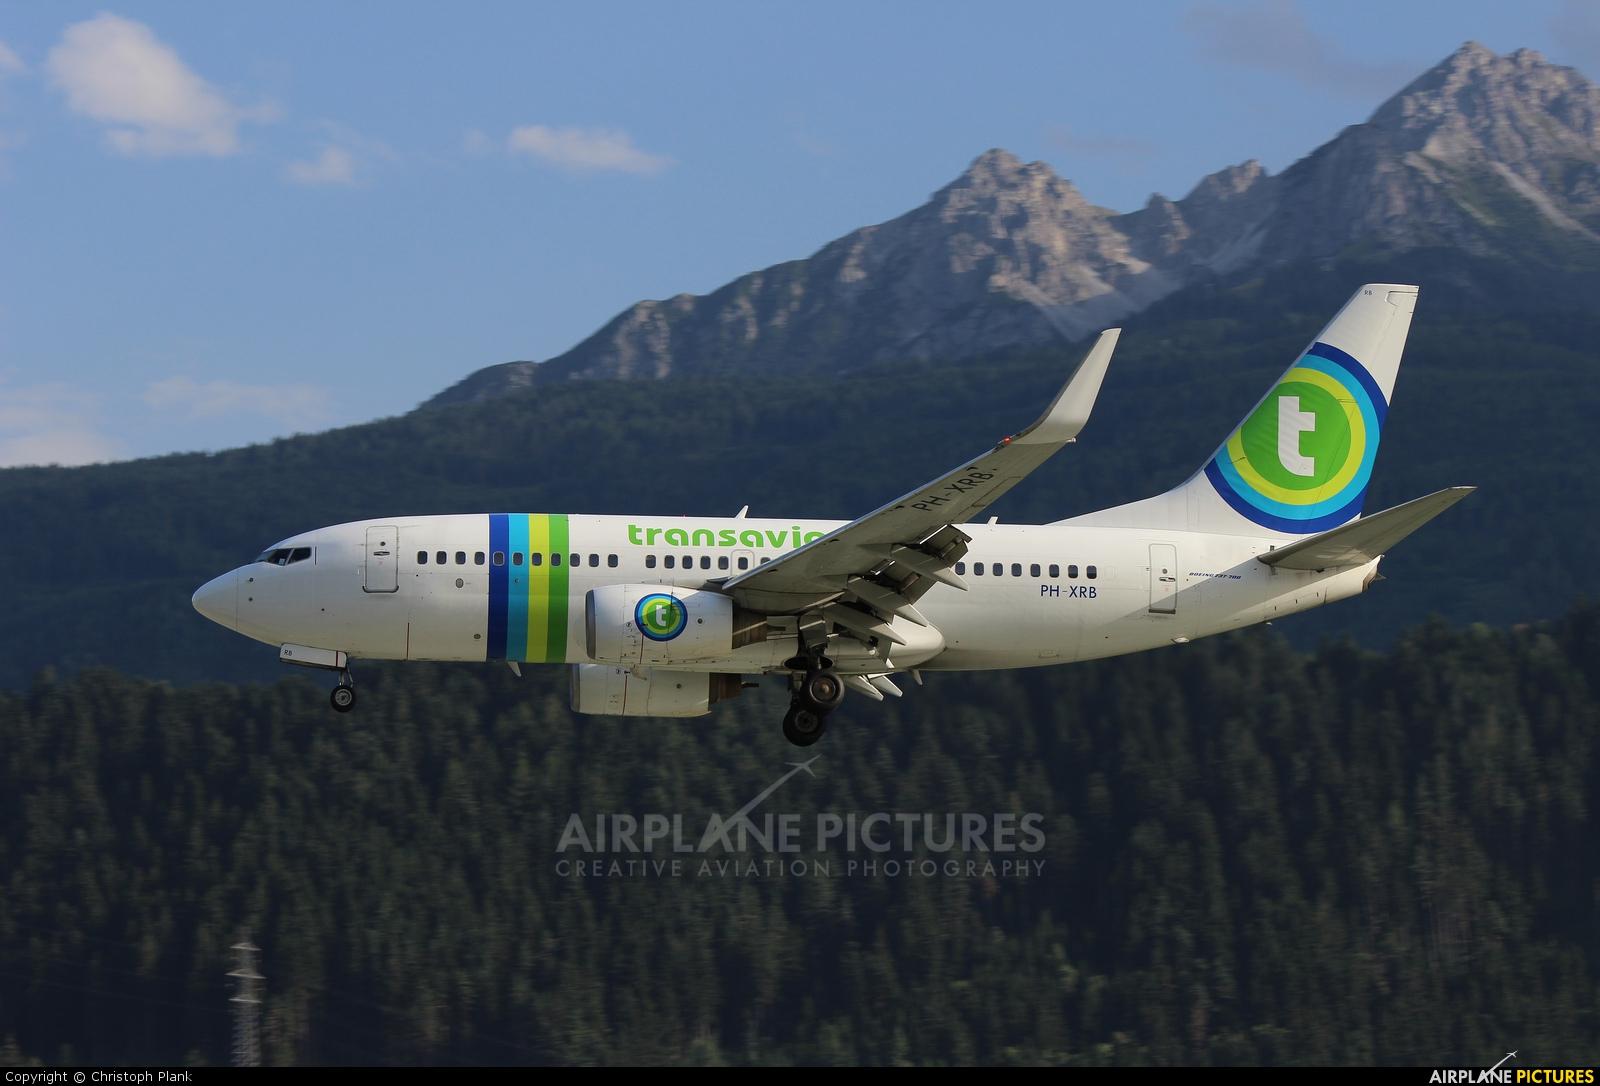 Transavia PH-XRB aircraft at Innsbruck